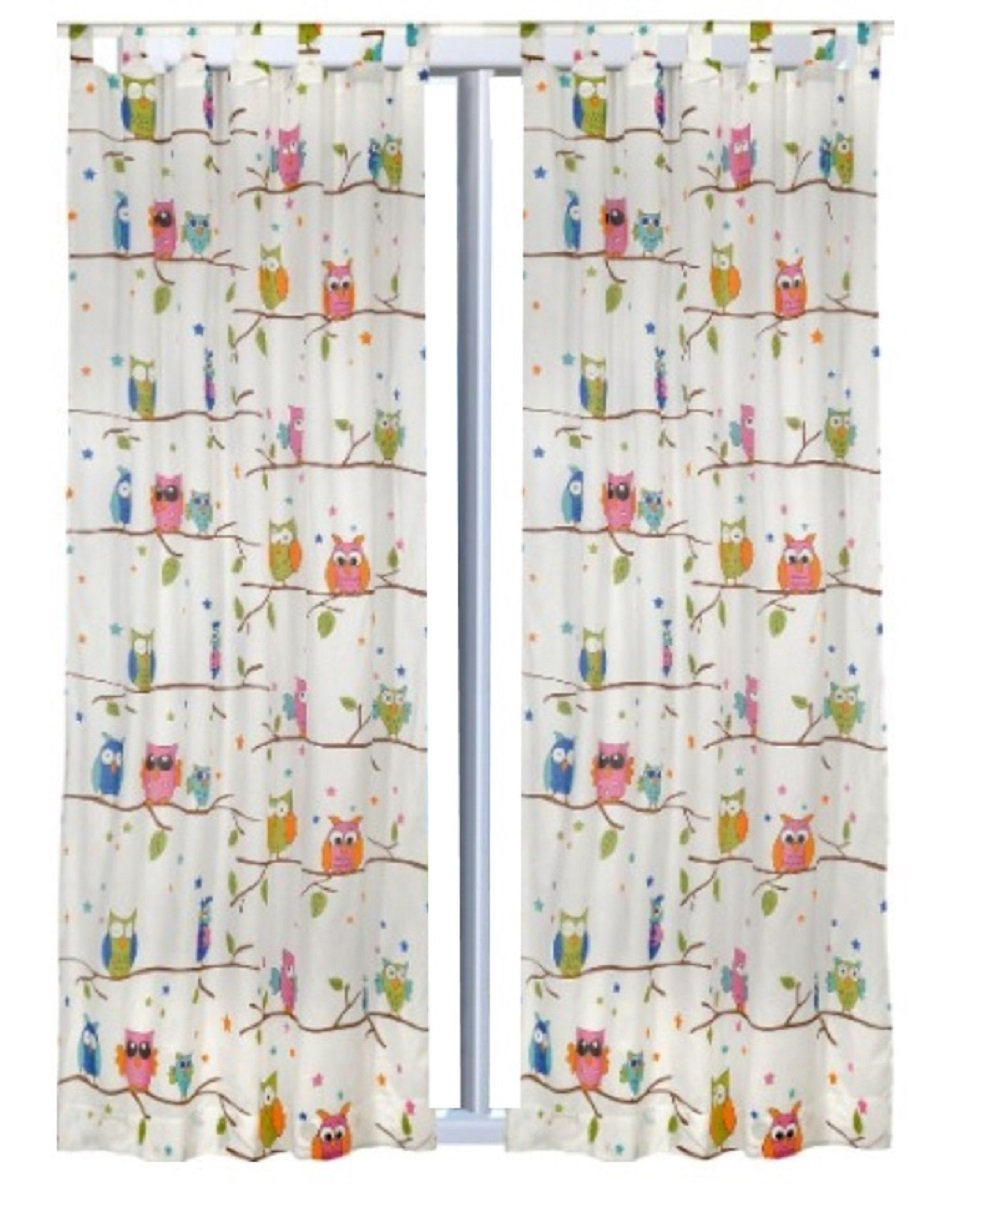 Trendprodukteshop - Set di 2 tende, 245 x 140 cm, motivo gufi